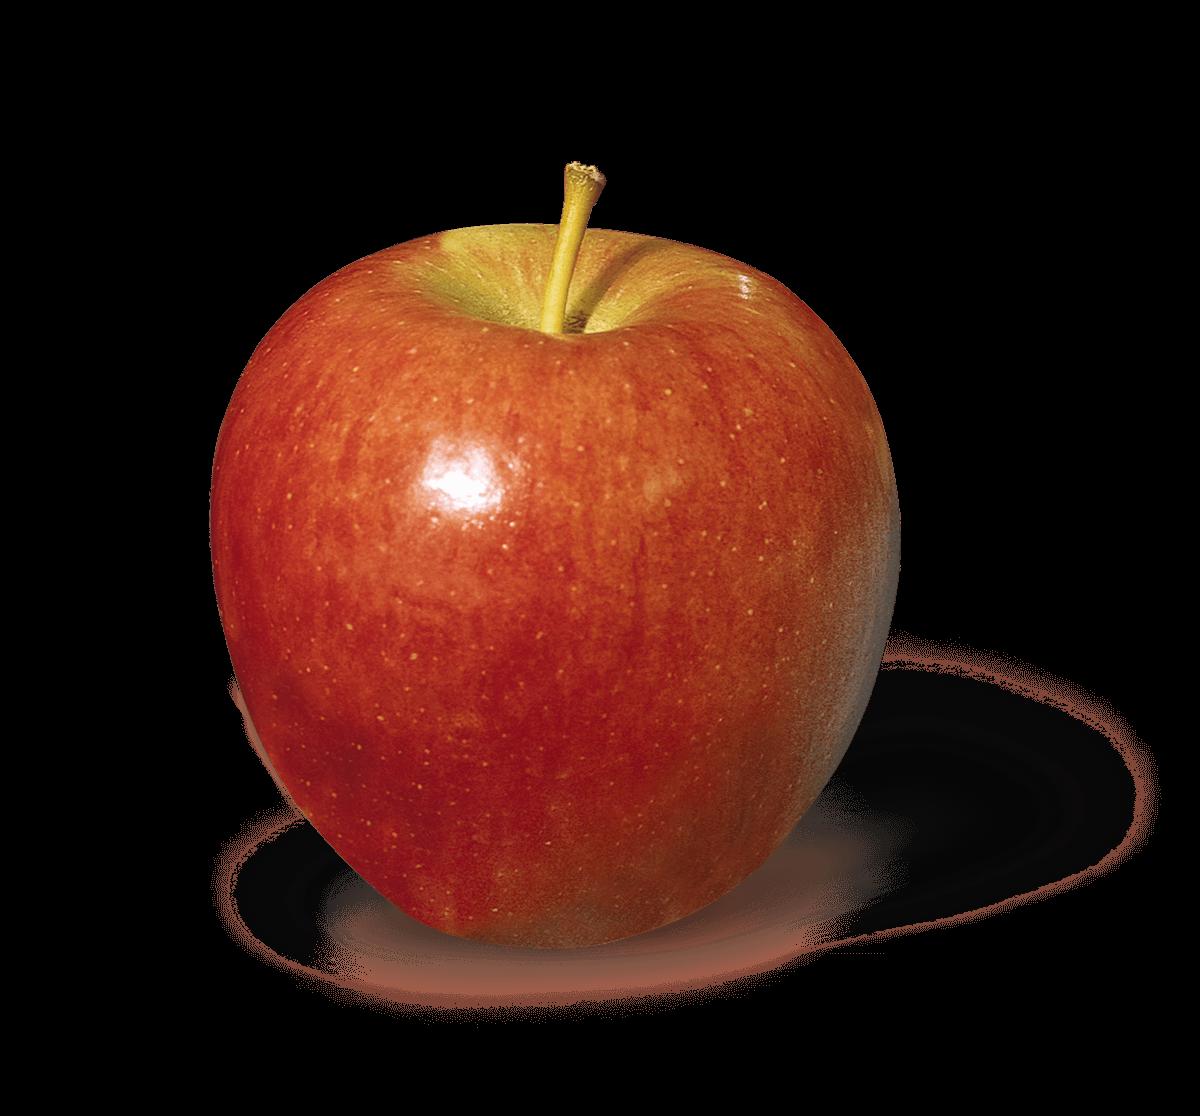 Apple Photo - Braeburn